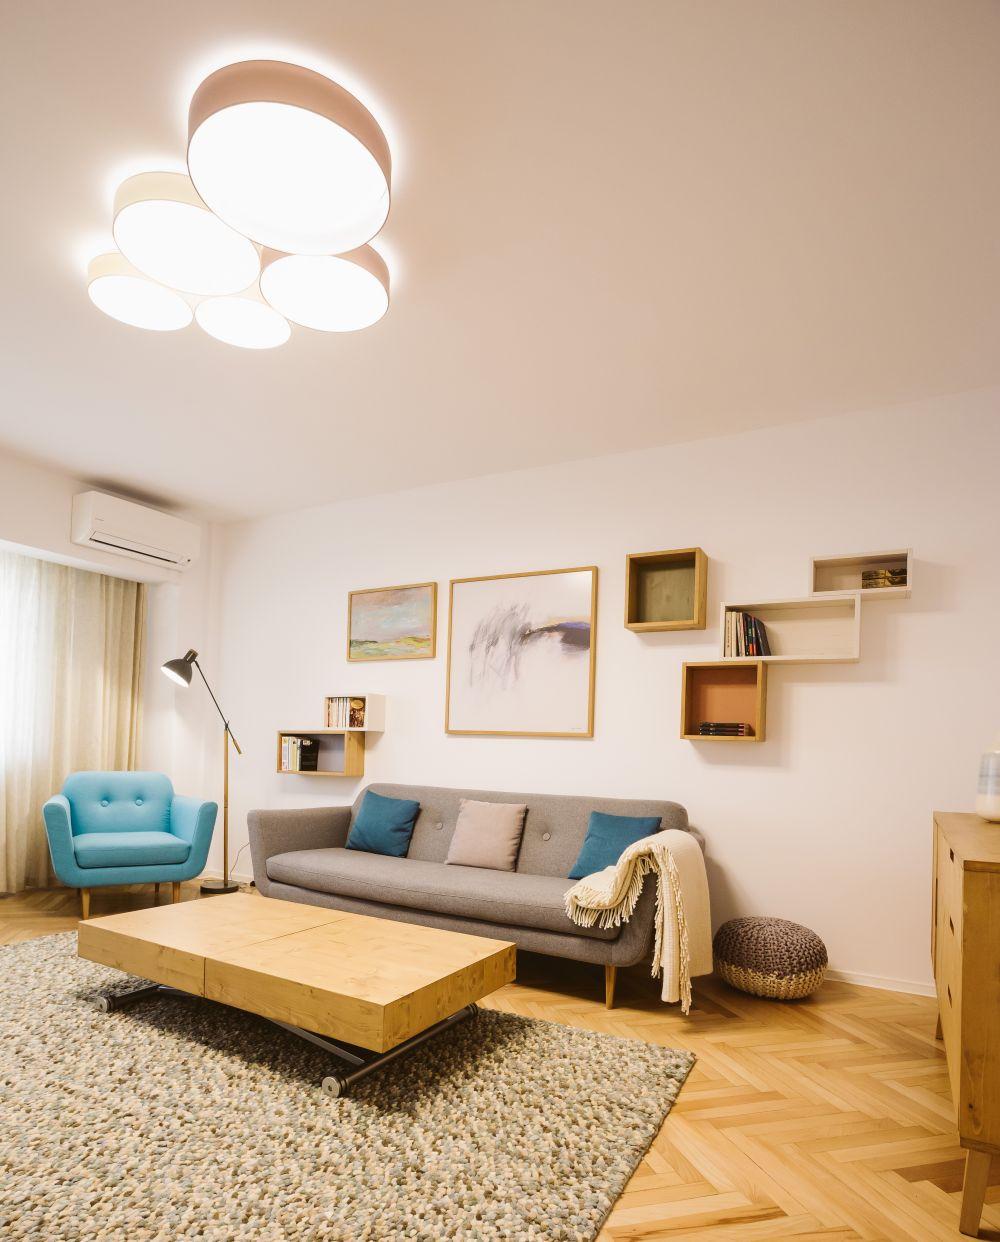 adelaparvu-com-despre-apartament-3-camere-bucuresti-reamenajat-designer-mihaela-cetanas-foto-cezar-buliga-2